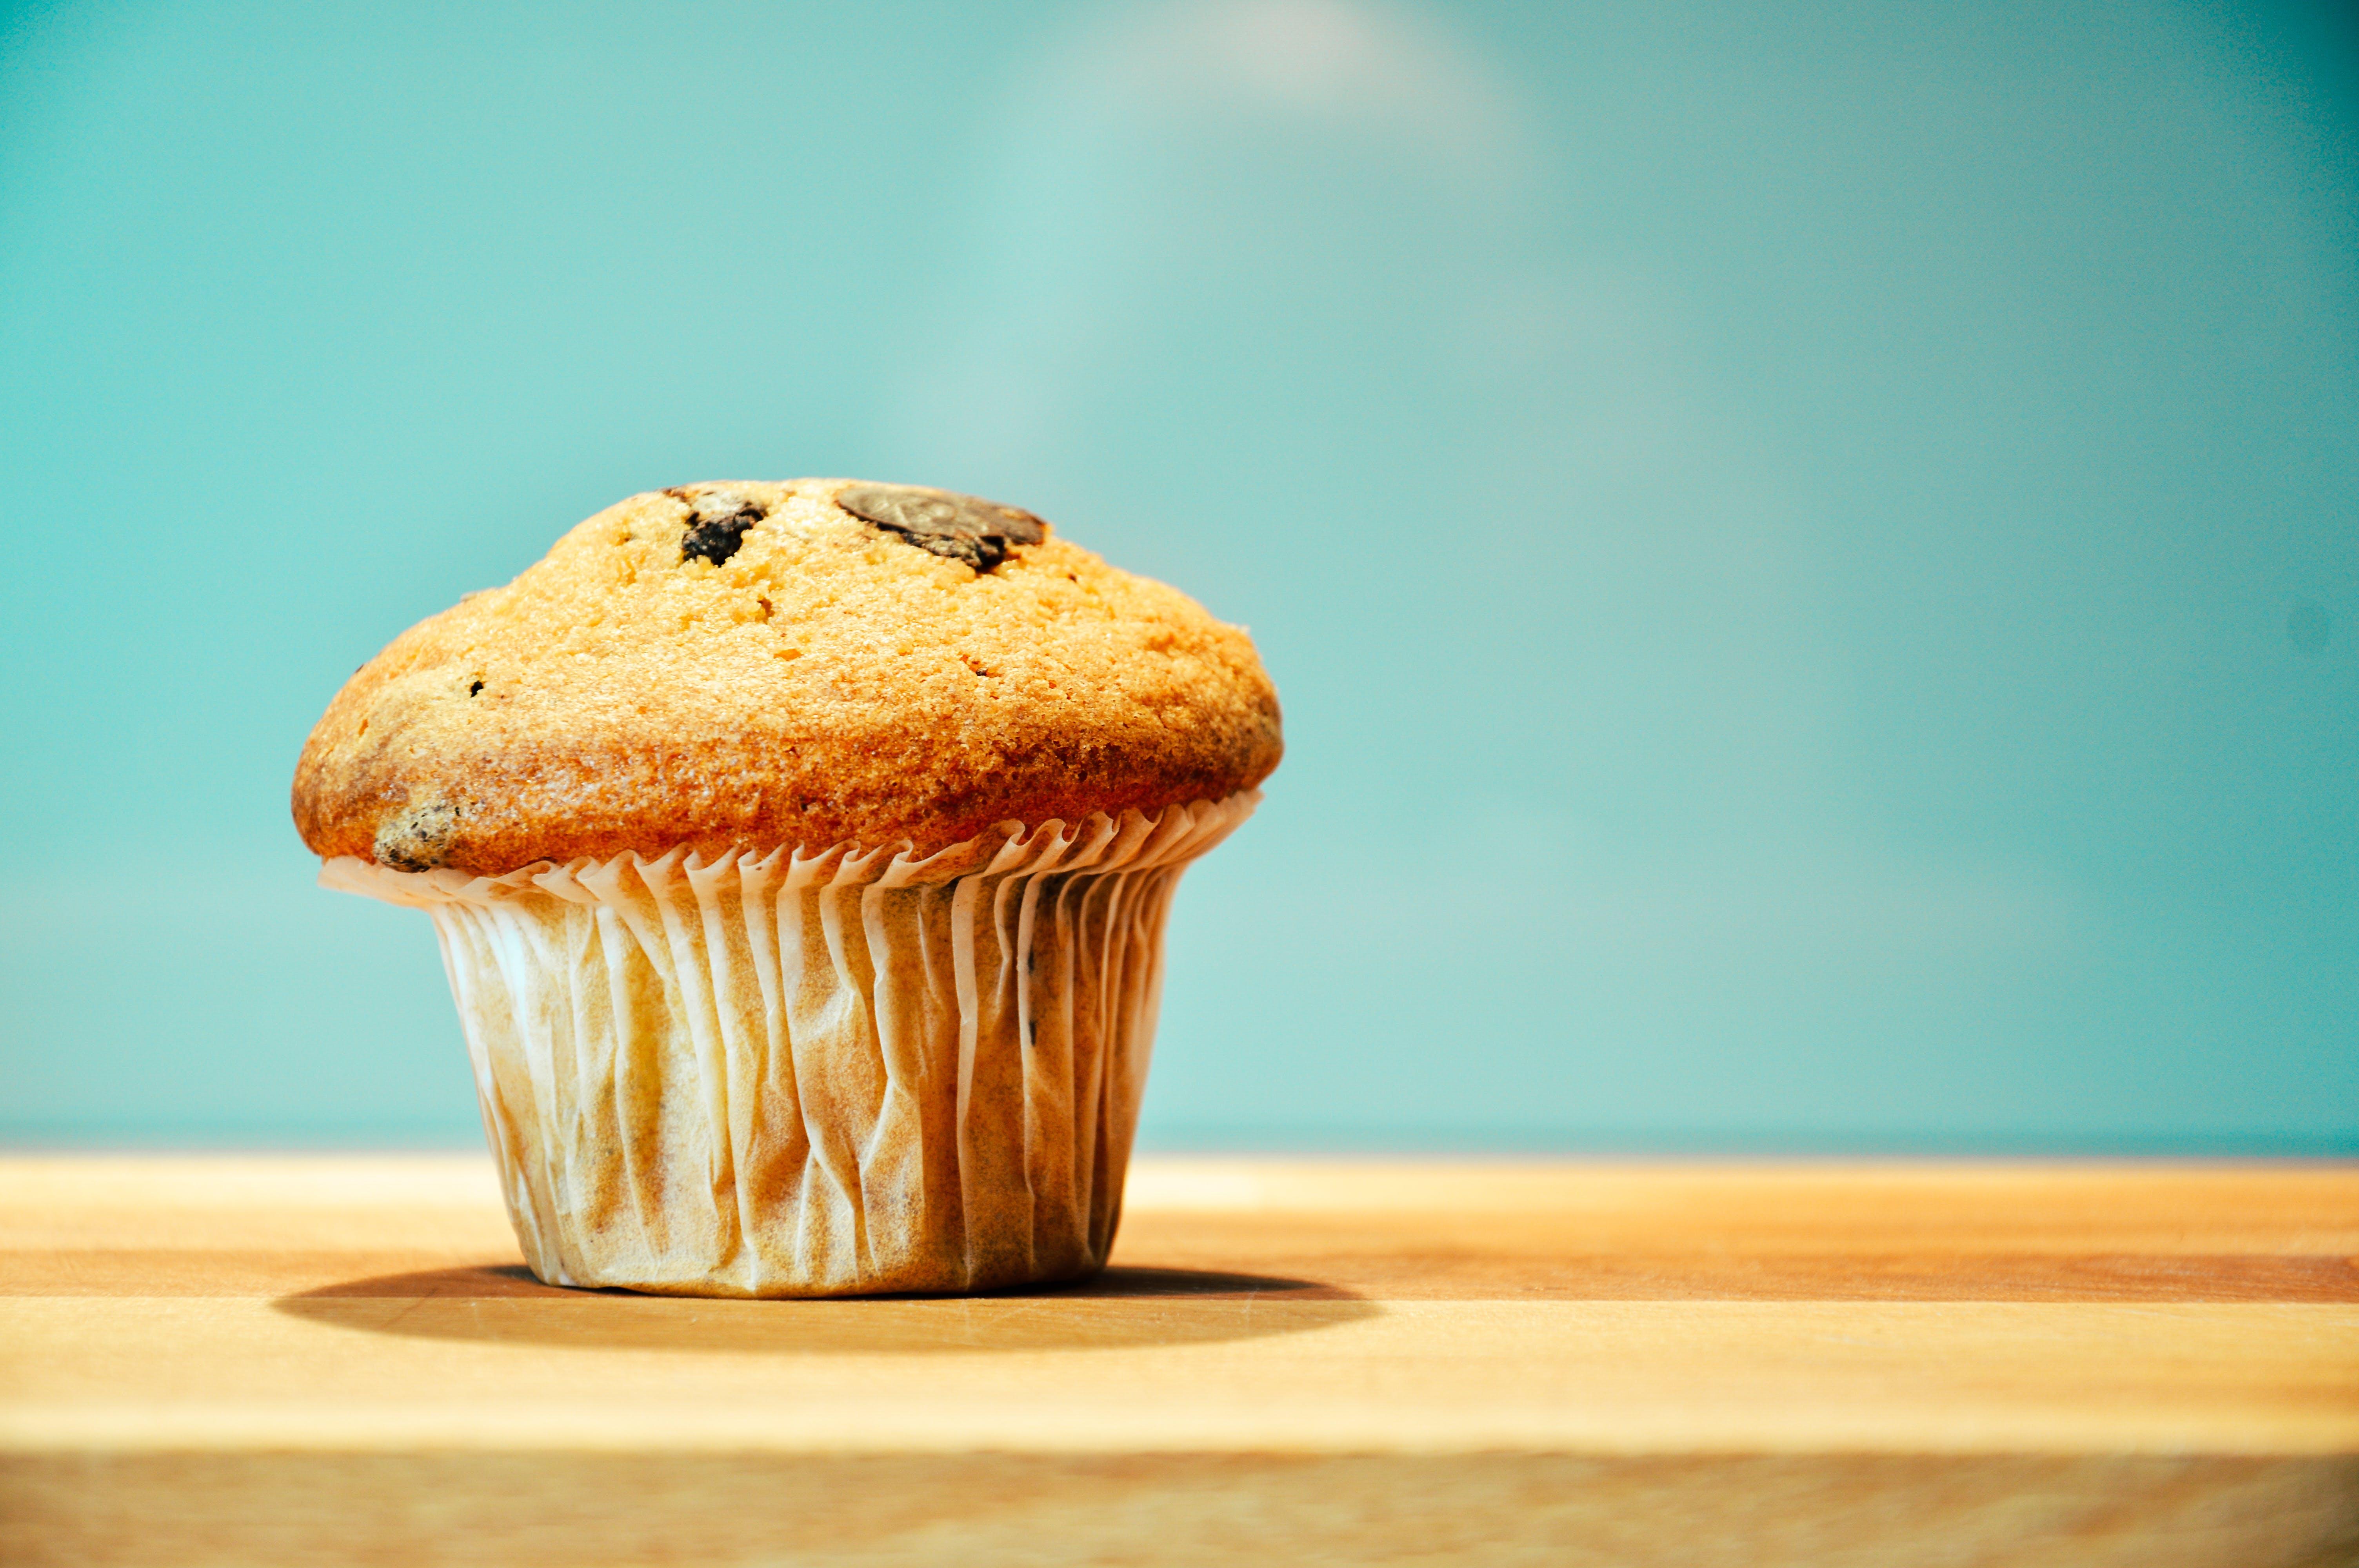 Free stock photo of food, bakery, dessert, sweet